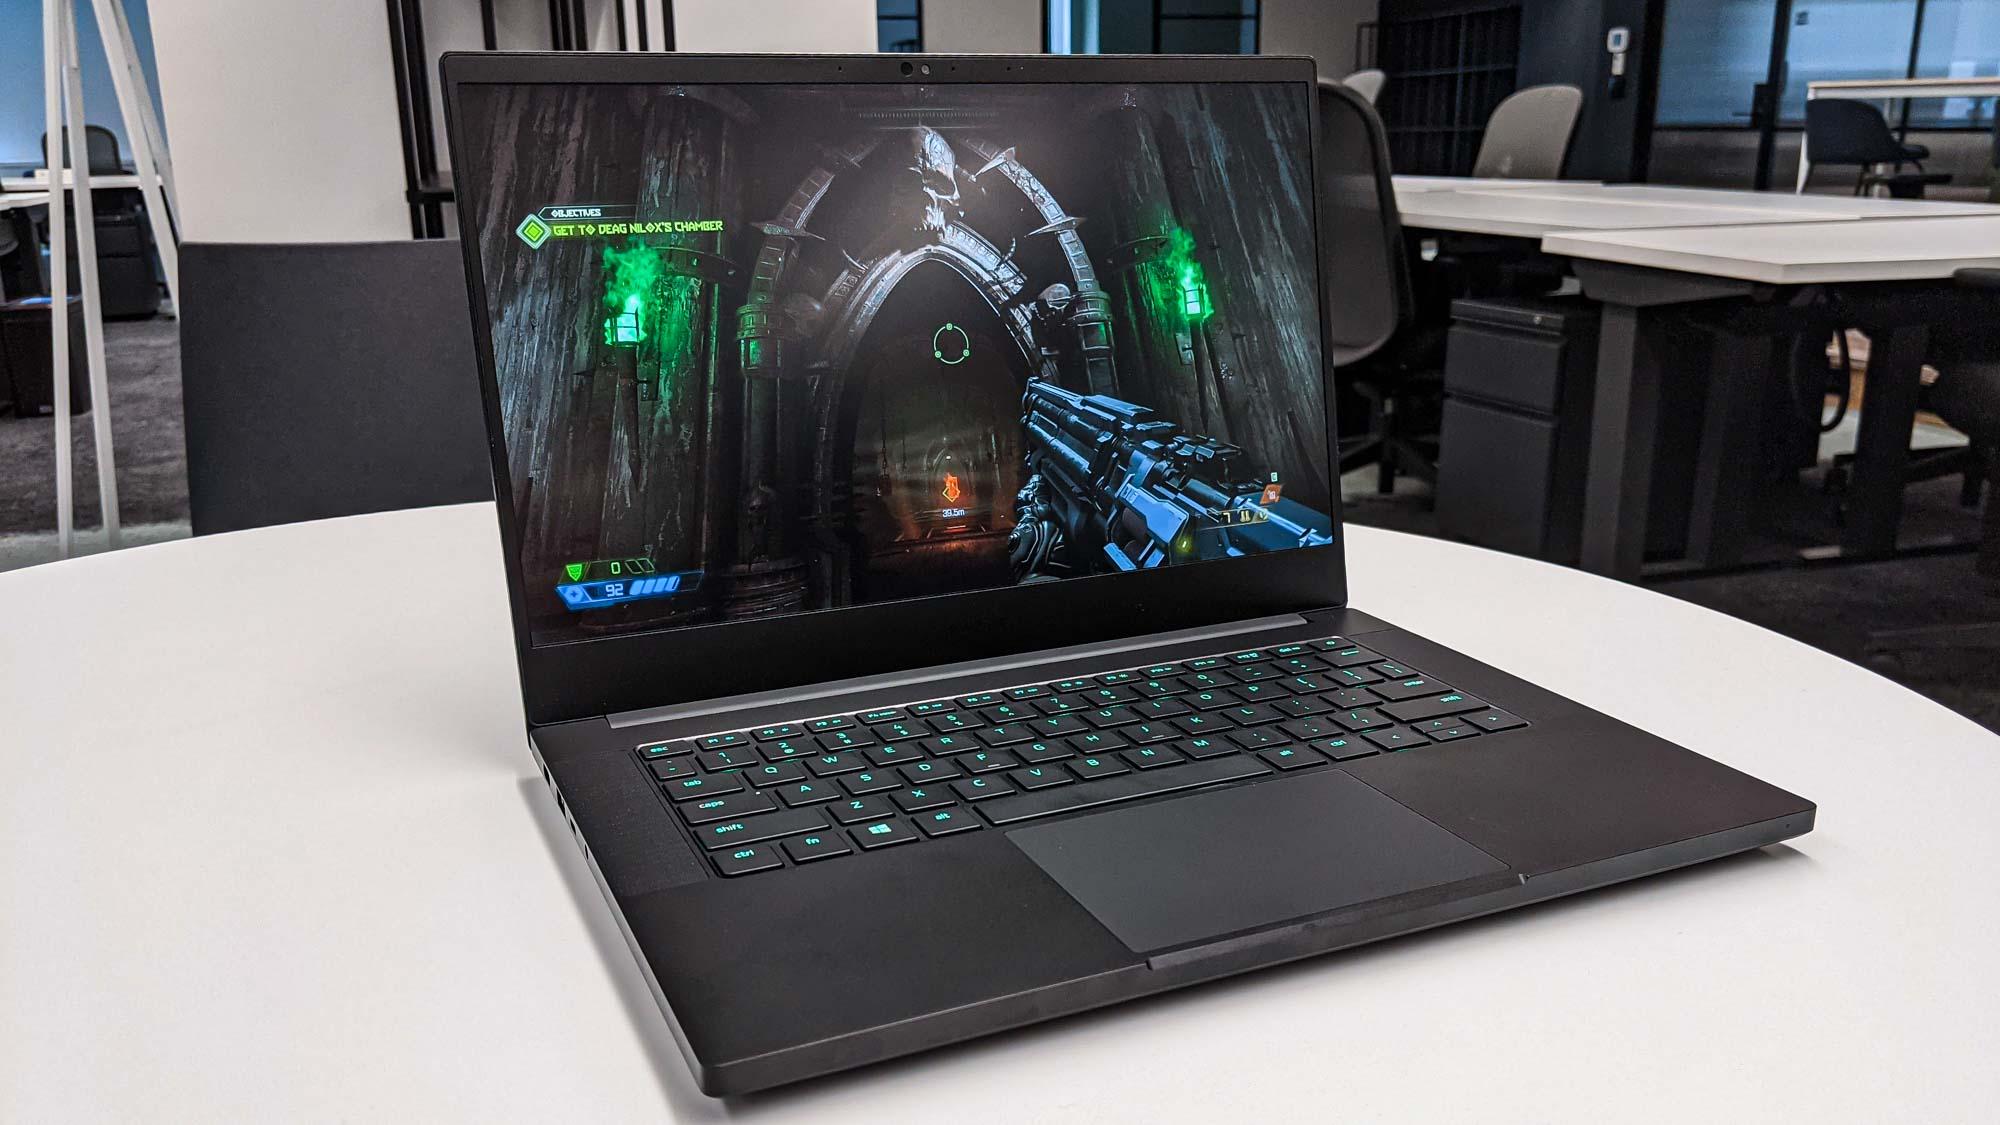 Best laptops for engineering students: Razer blade 14